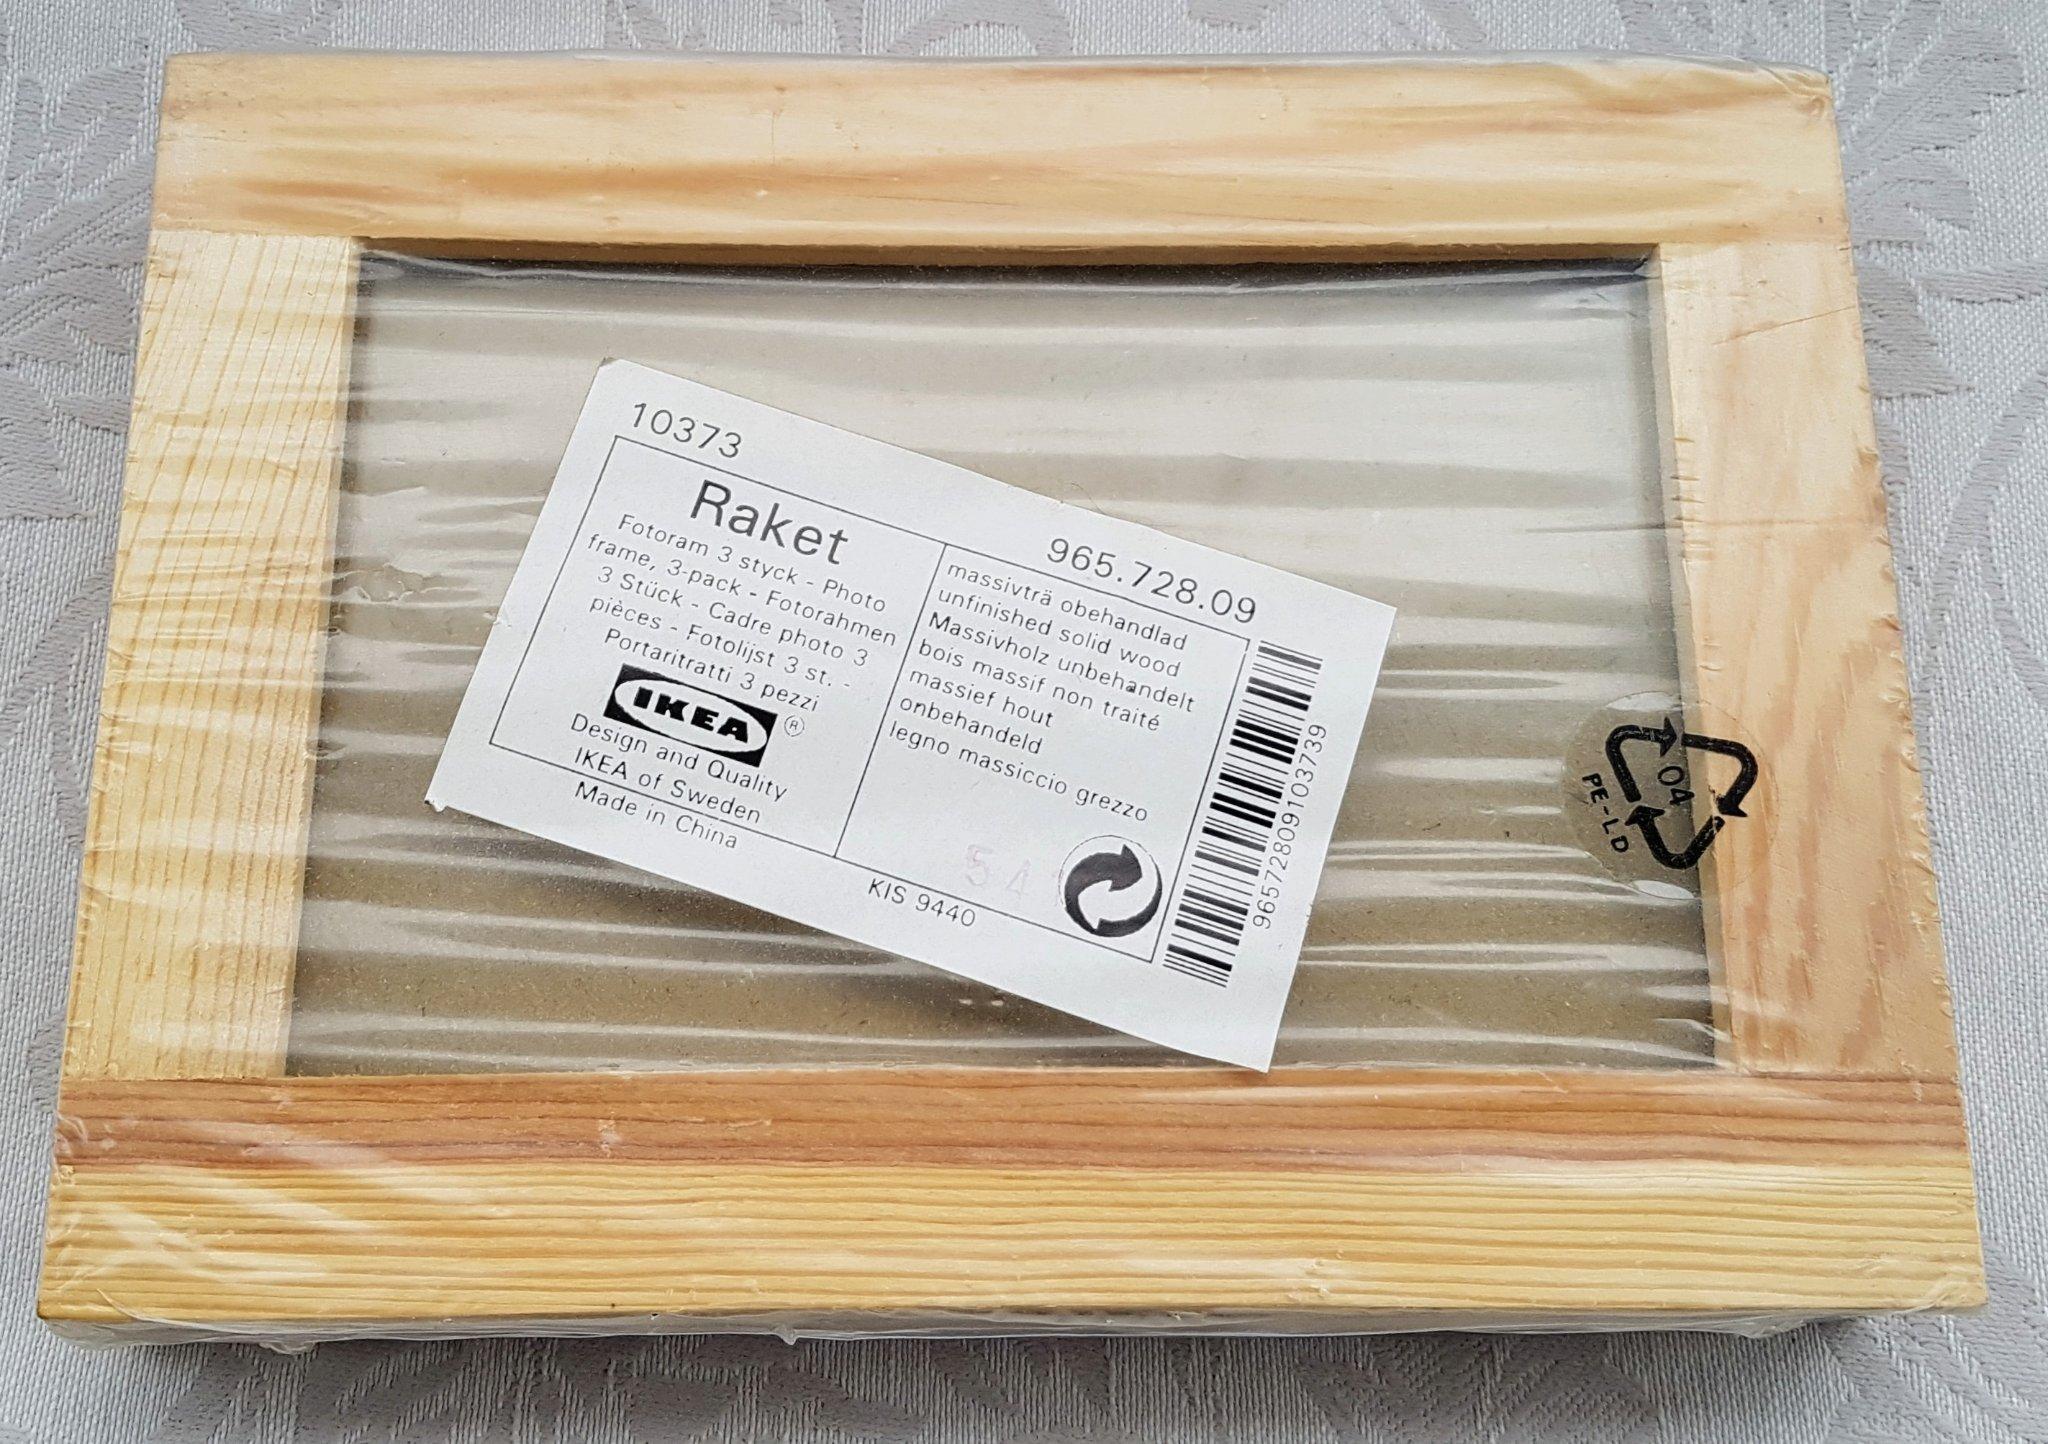 In Legno Wood Design 3 ramar i massivt obehandlat trä